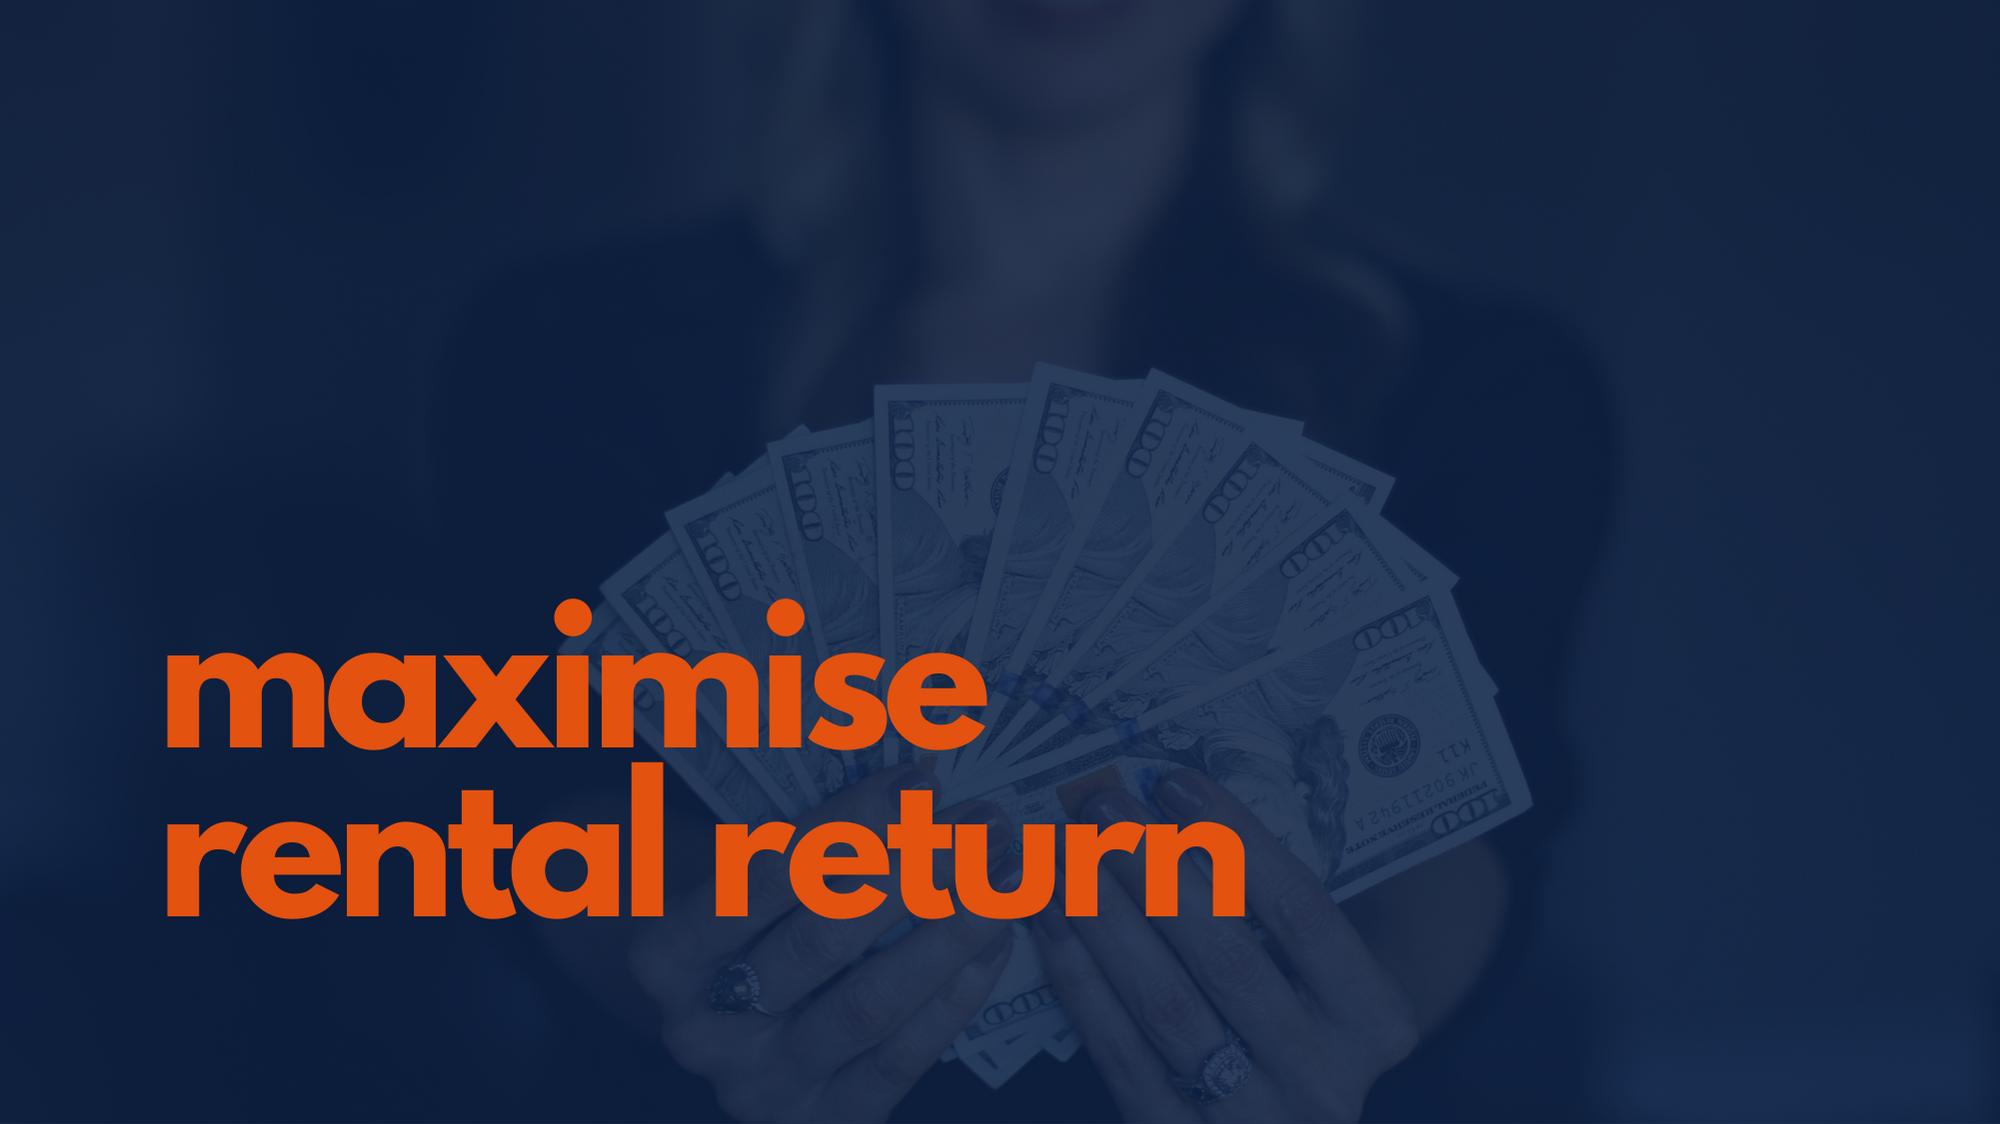 maximise rental return